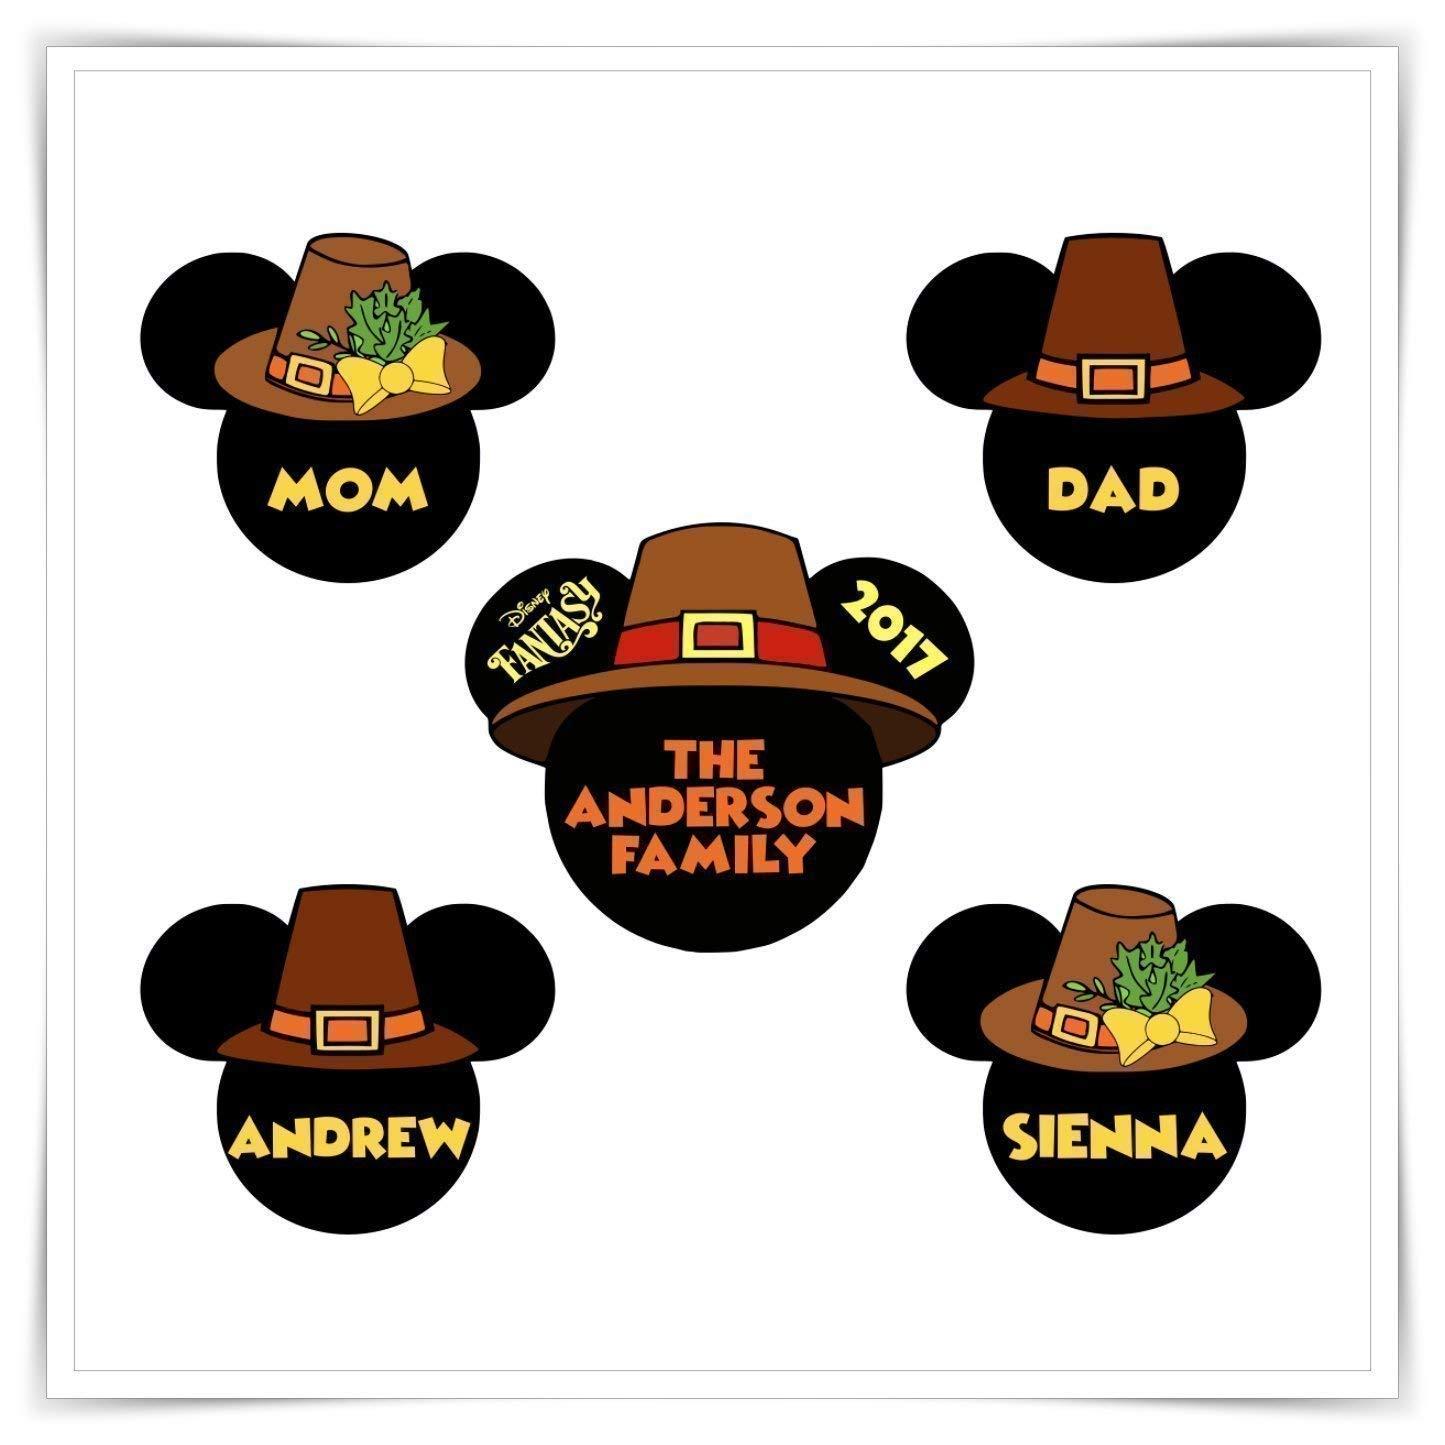 Handmade Thanksgiving Customized Family Magnet Personalized Disney Inspired Thanksgiving Pilgrim Magnet Stateroom Pilgrim Heads Door Magnets